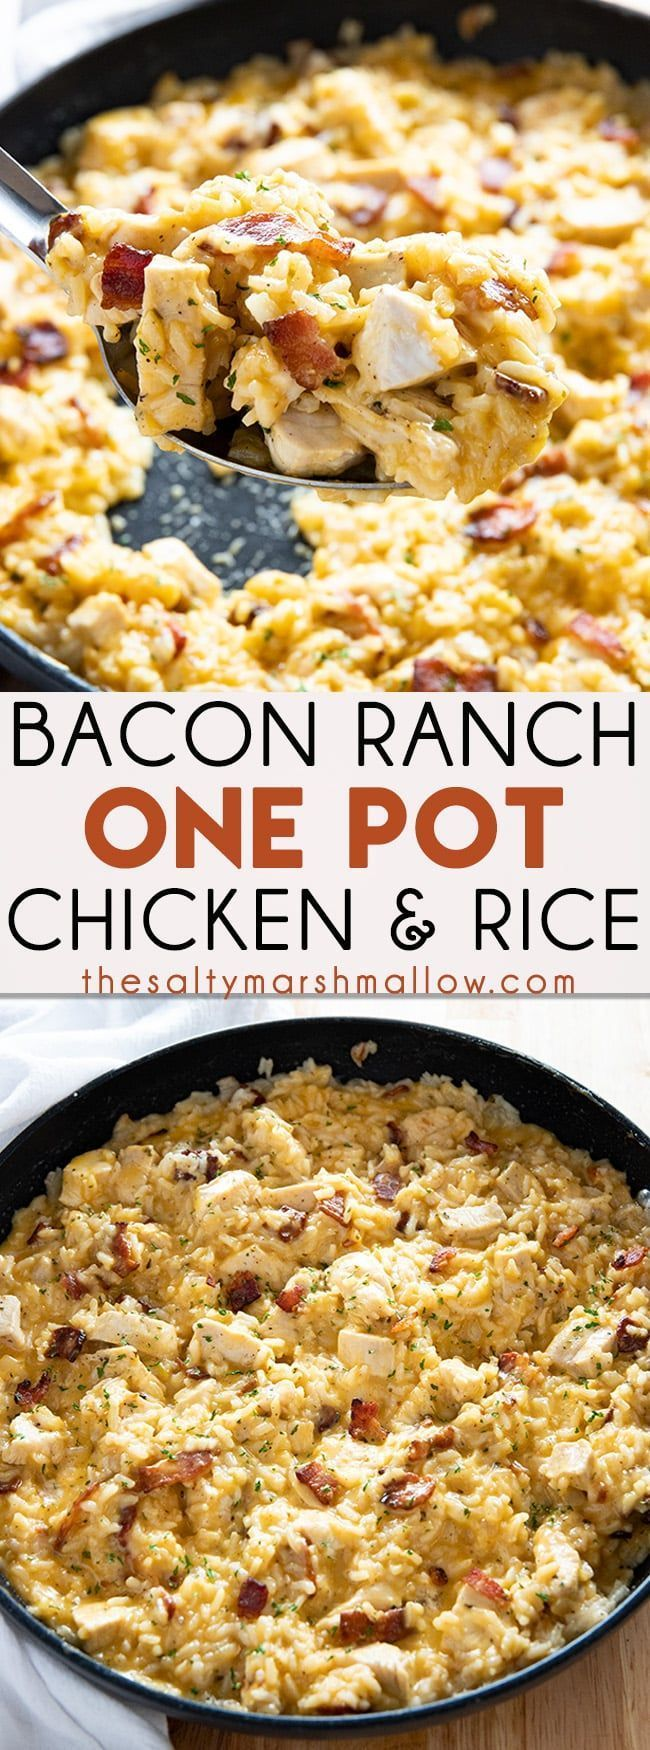 Bacon Ranch One Pot Chicken and Ricebacon